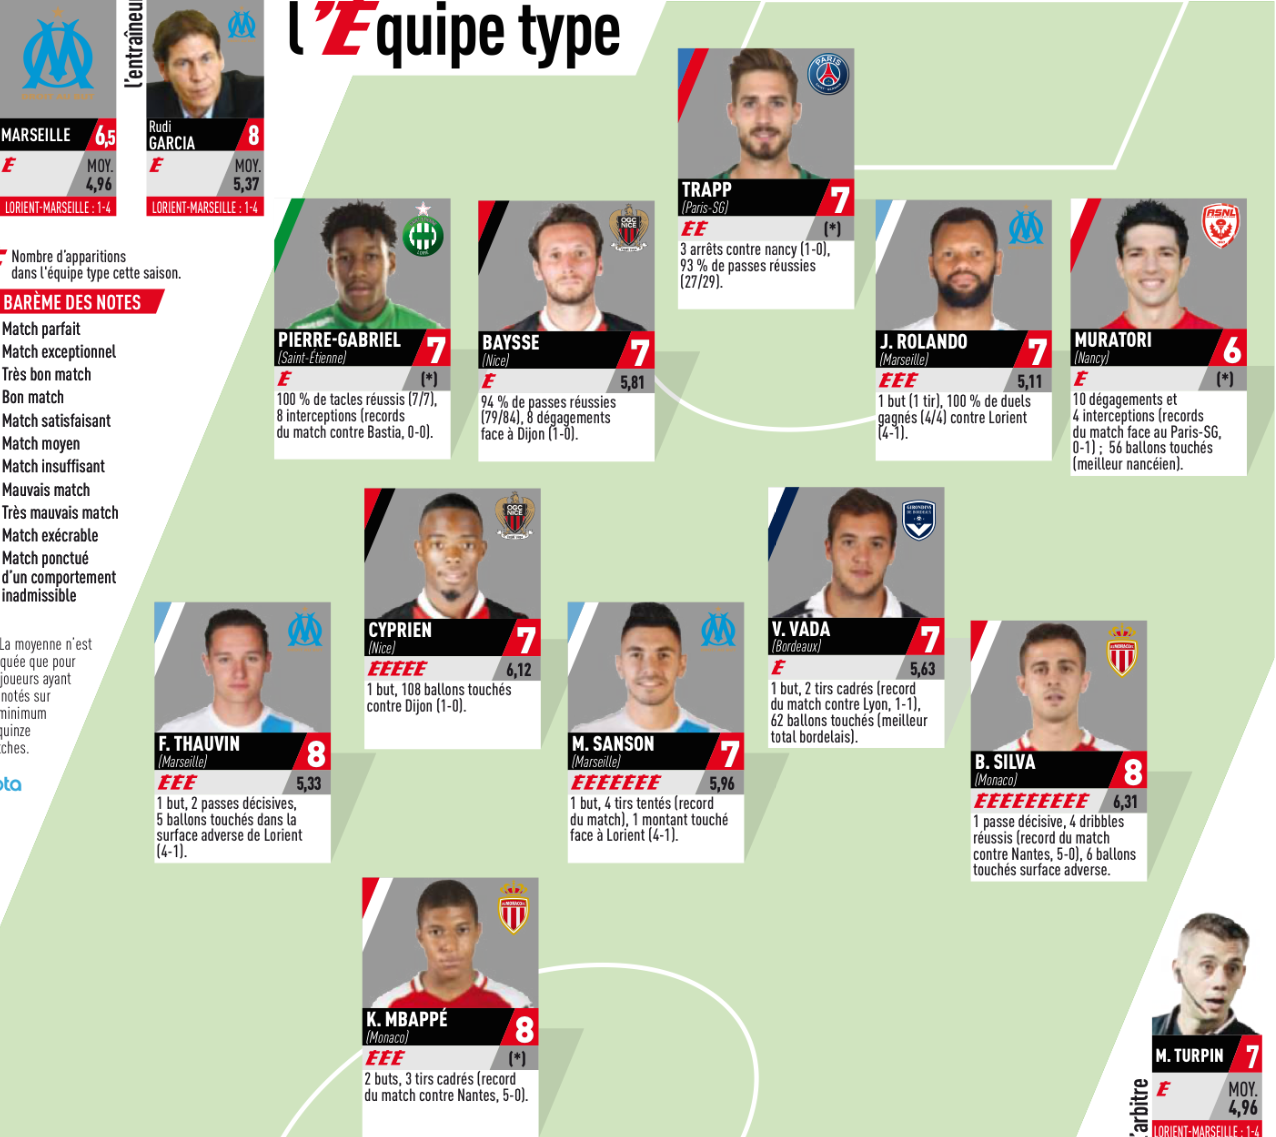 Bastia 0 3 Psg Match Report: OM, ASSE, Girondins, PSG : Ils Sont Dans L'équipe-type